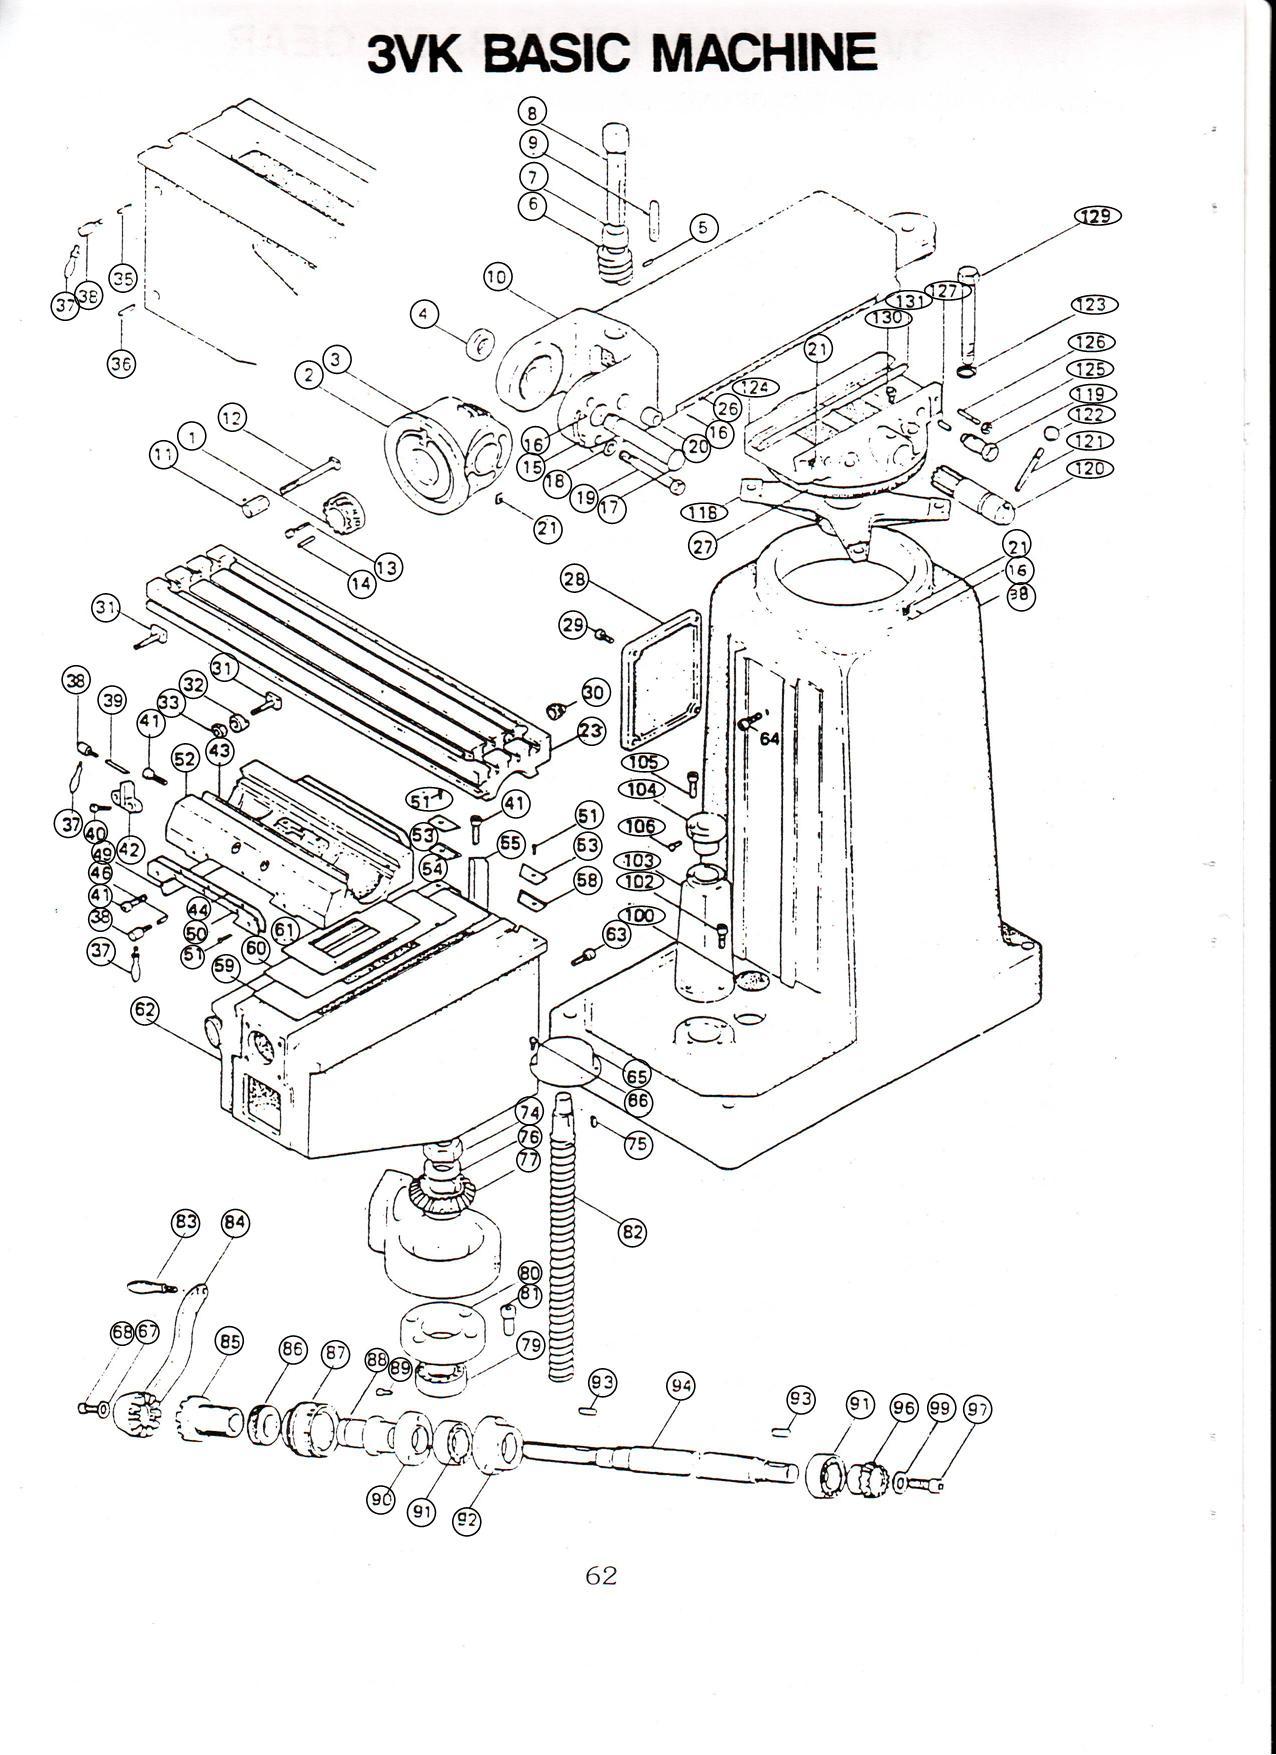 Ultima 3VS/3VK/3VKH Basic Machine [Mouse-over Pricing for